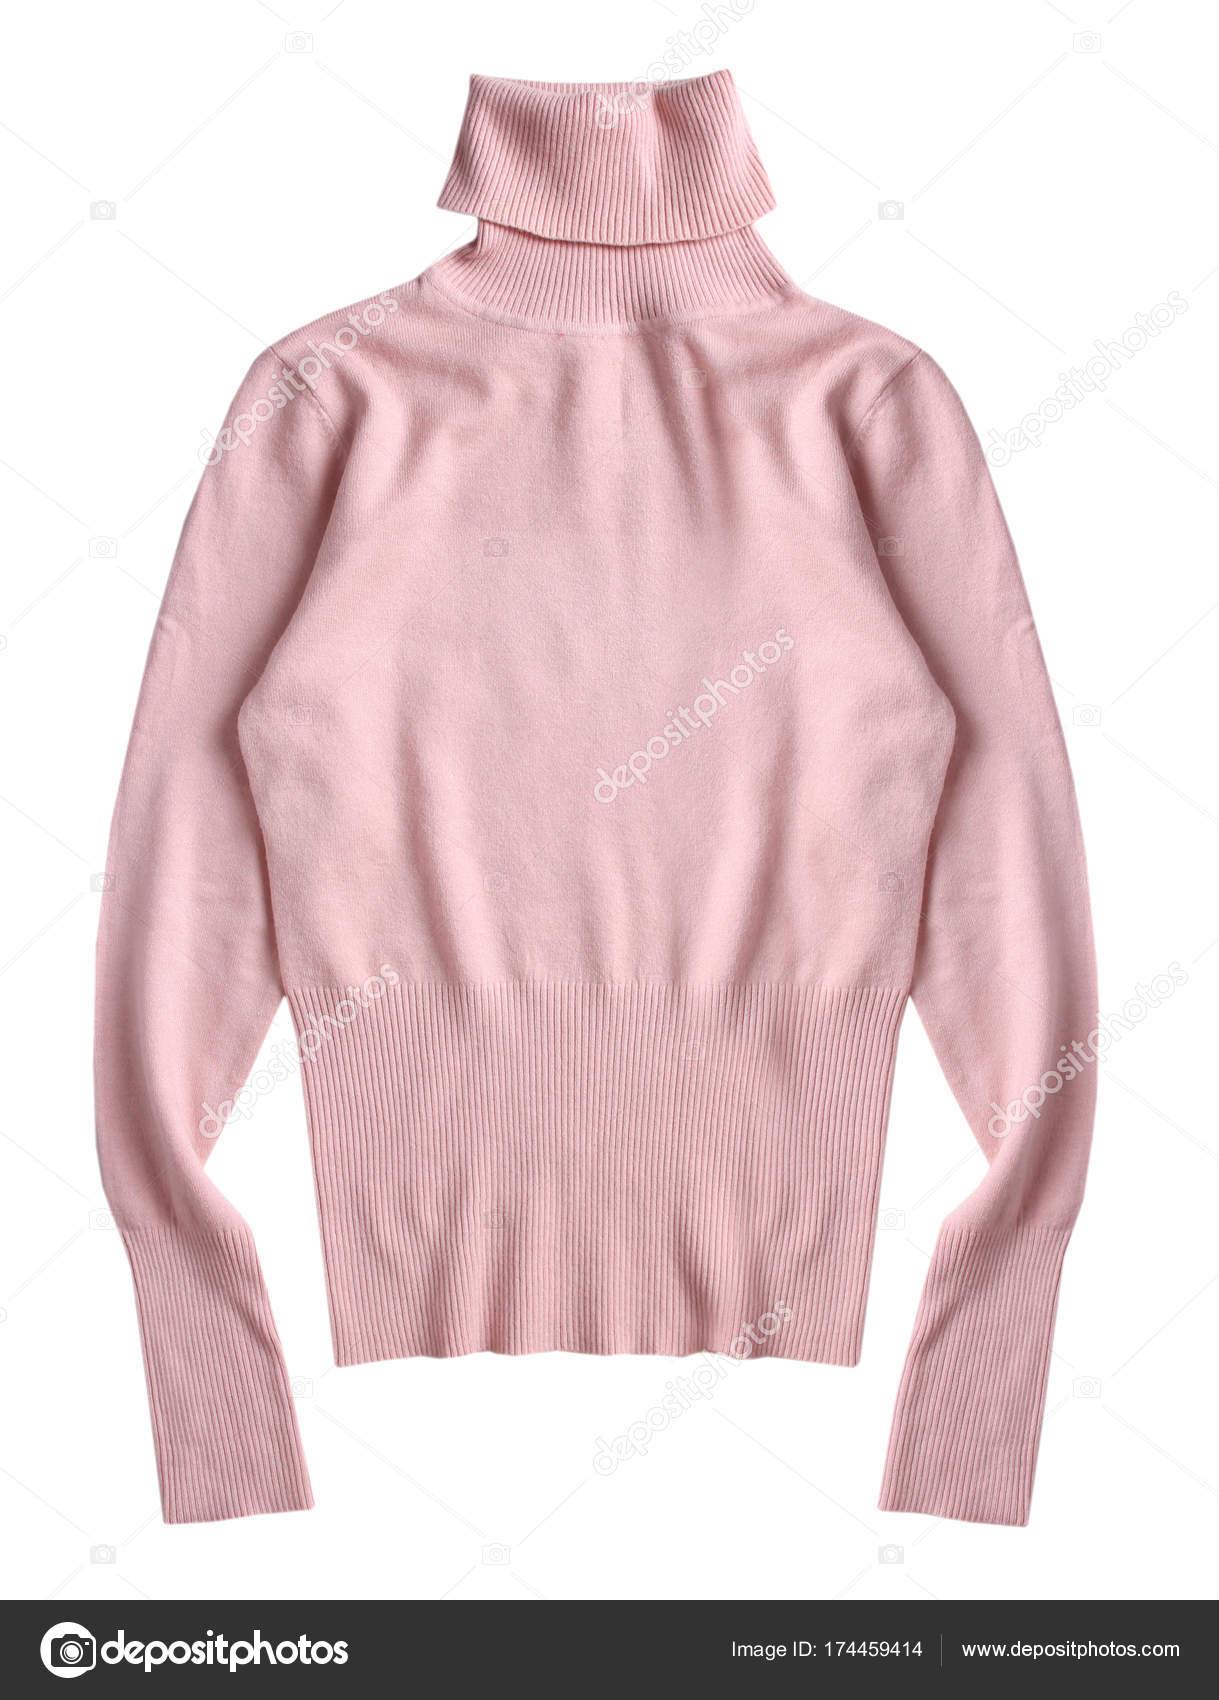 c7def9c1942f Ζιβάγκο μαλακό ροζ πλεκτό πουλόβερ απομονωμένες — Φωτογραφία Αρχείου ...